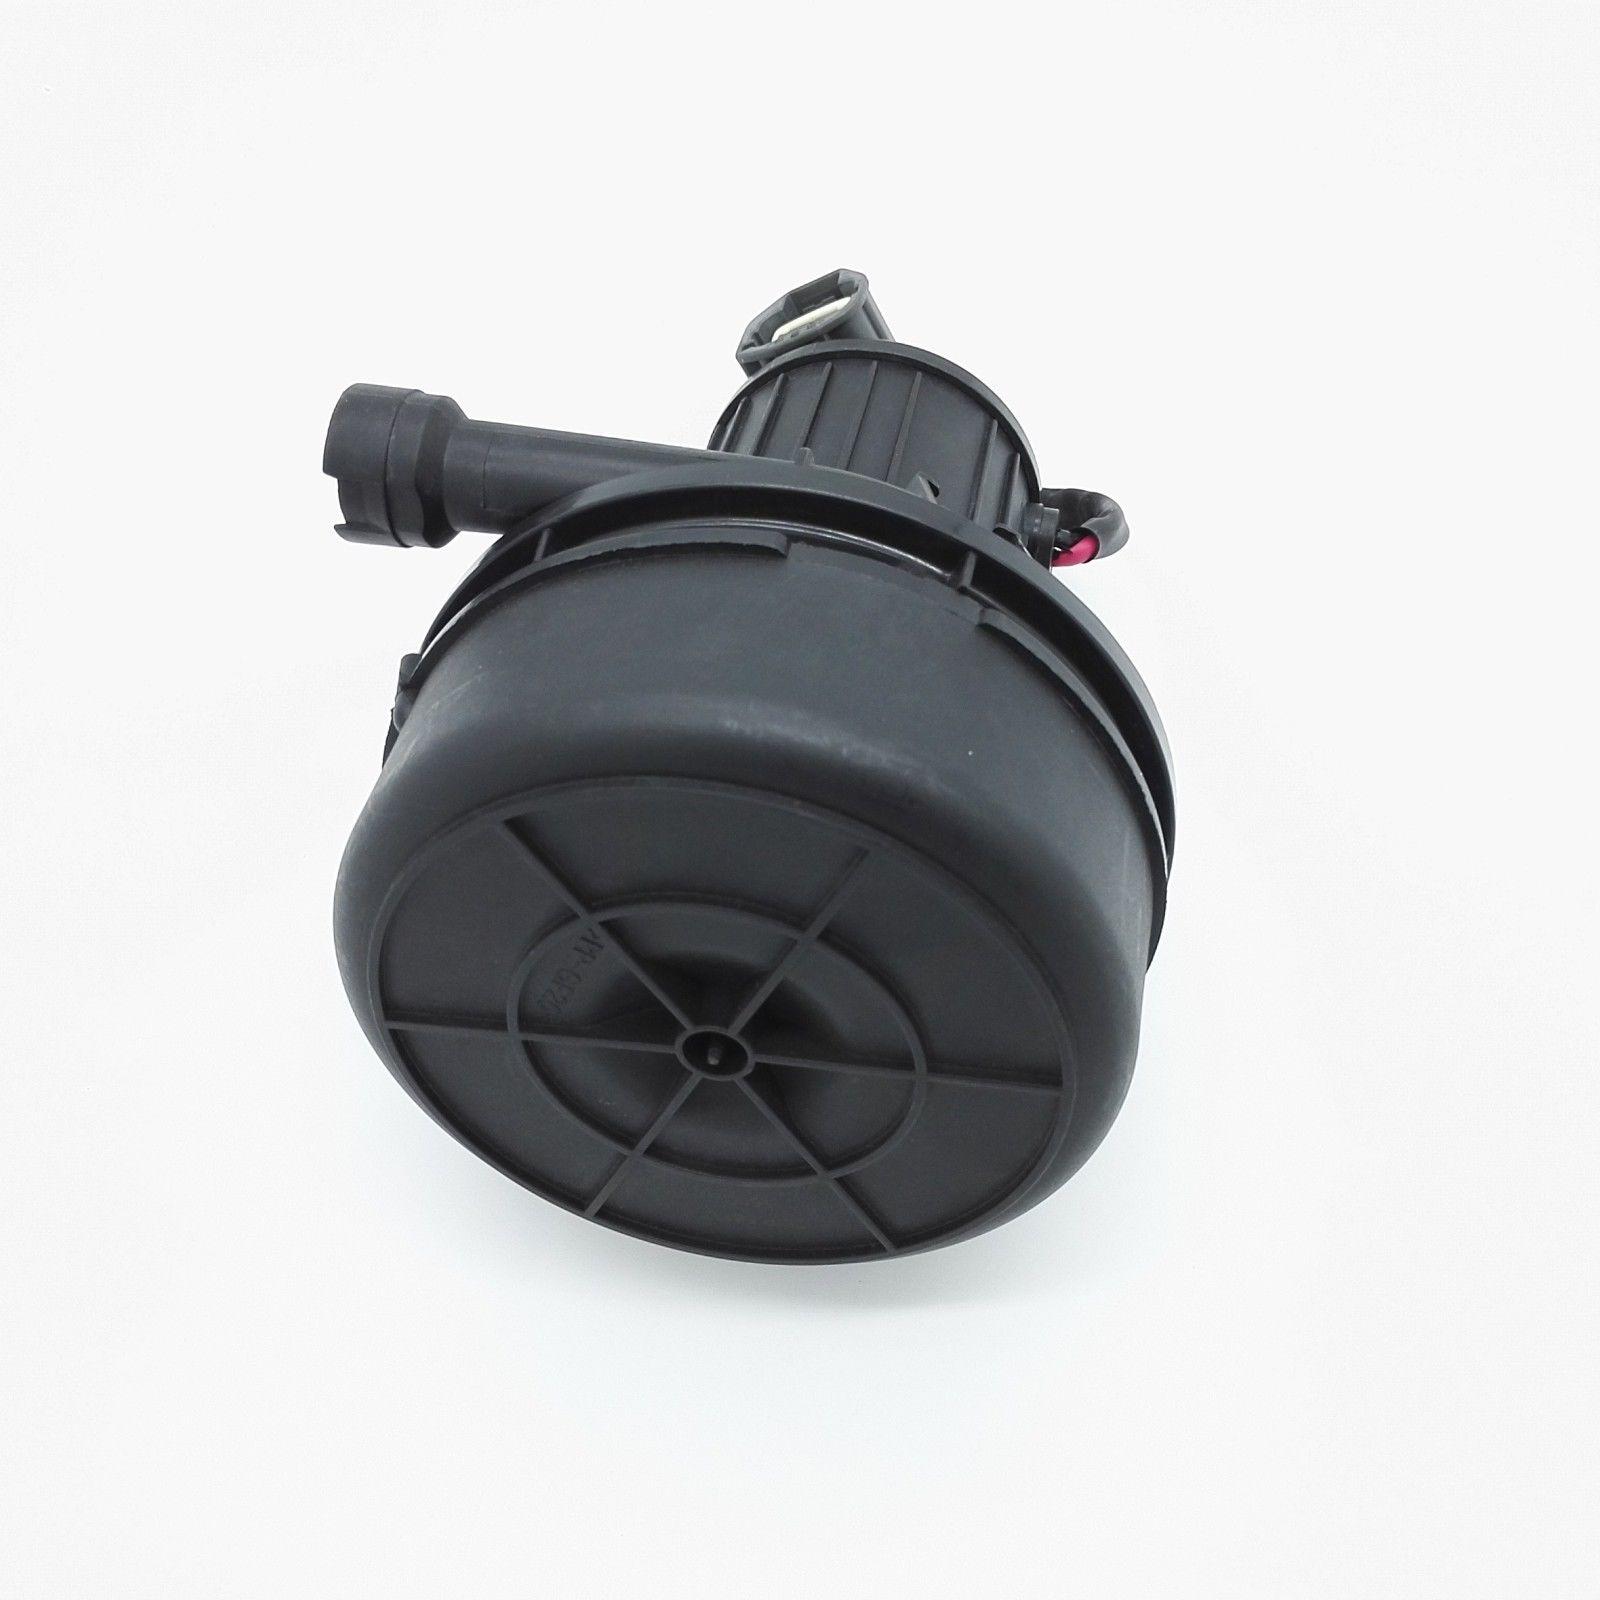 Secondary Air Pump for Jaugar XJ XJR XJ8 XF XFR-S S-Type Vanden Plas 6W839A486AA